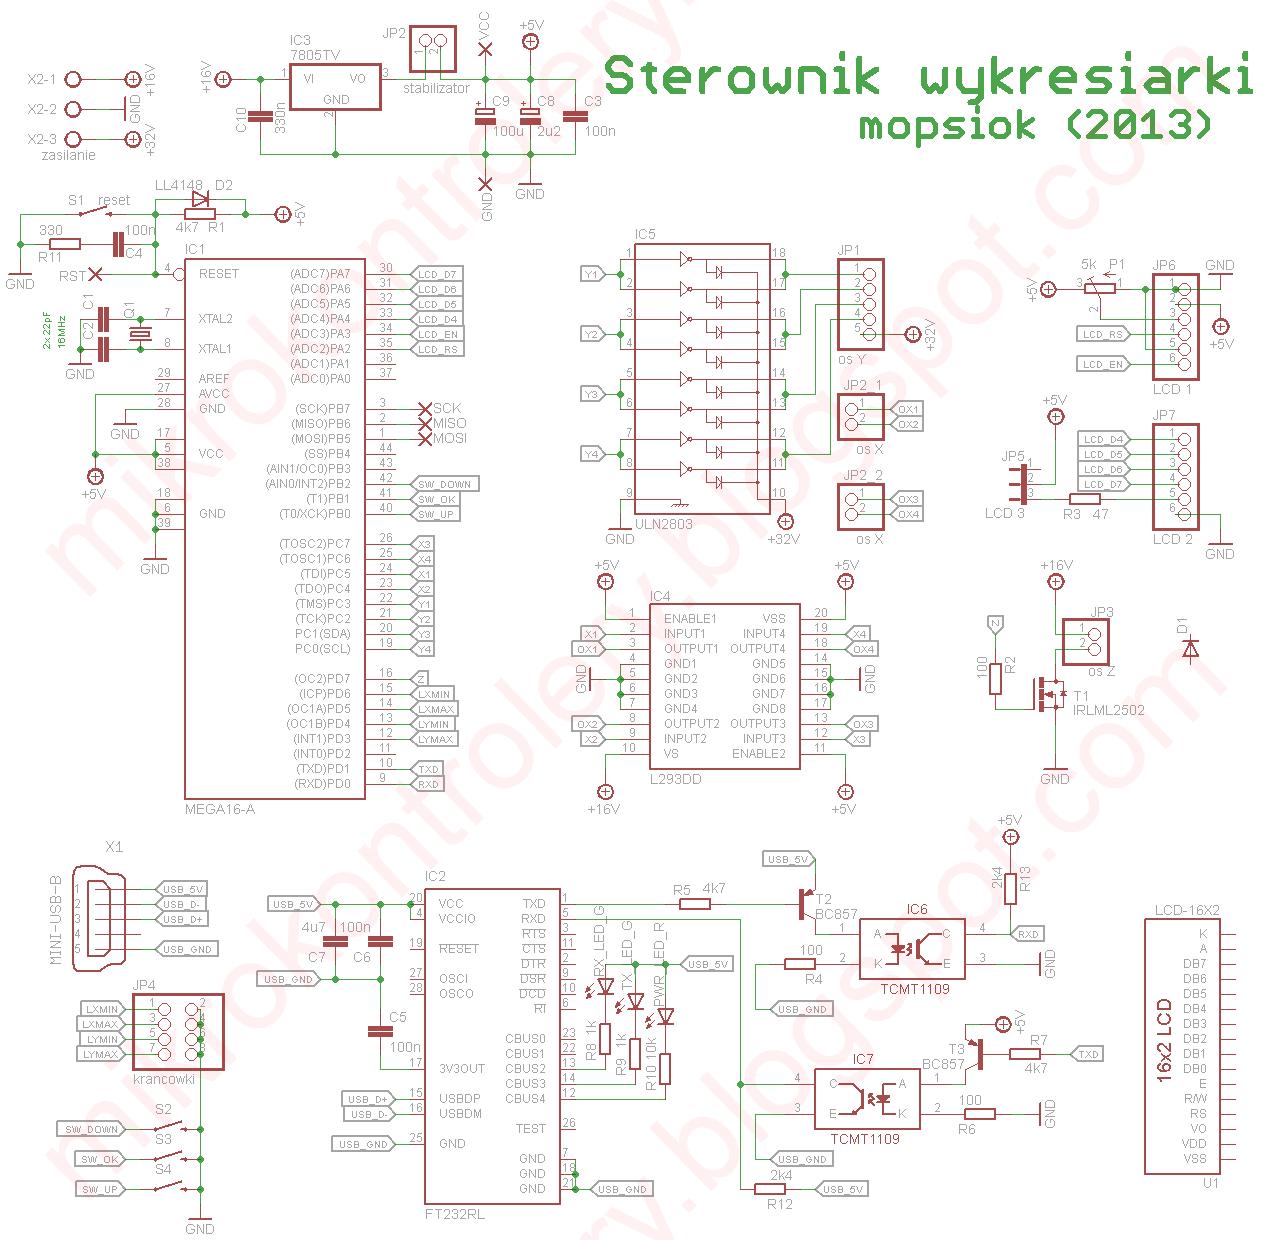 Schemat sterownika Wykresiarki (plotera).